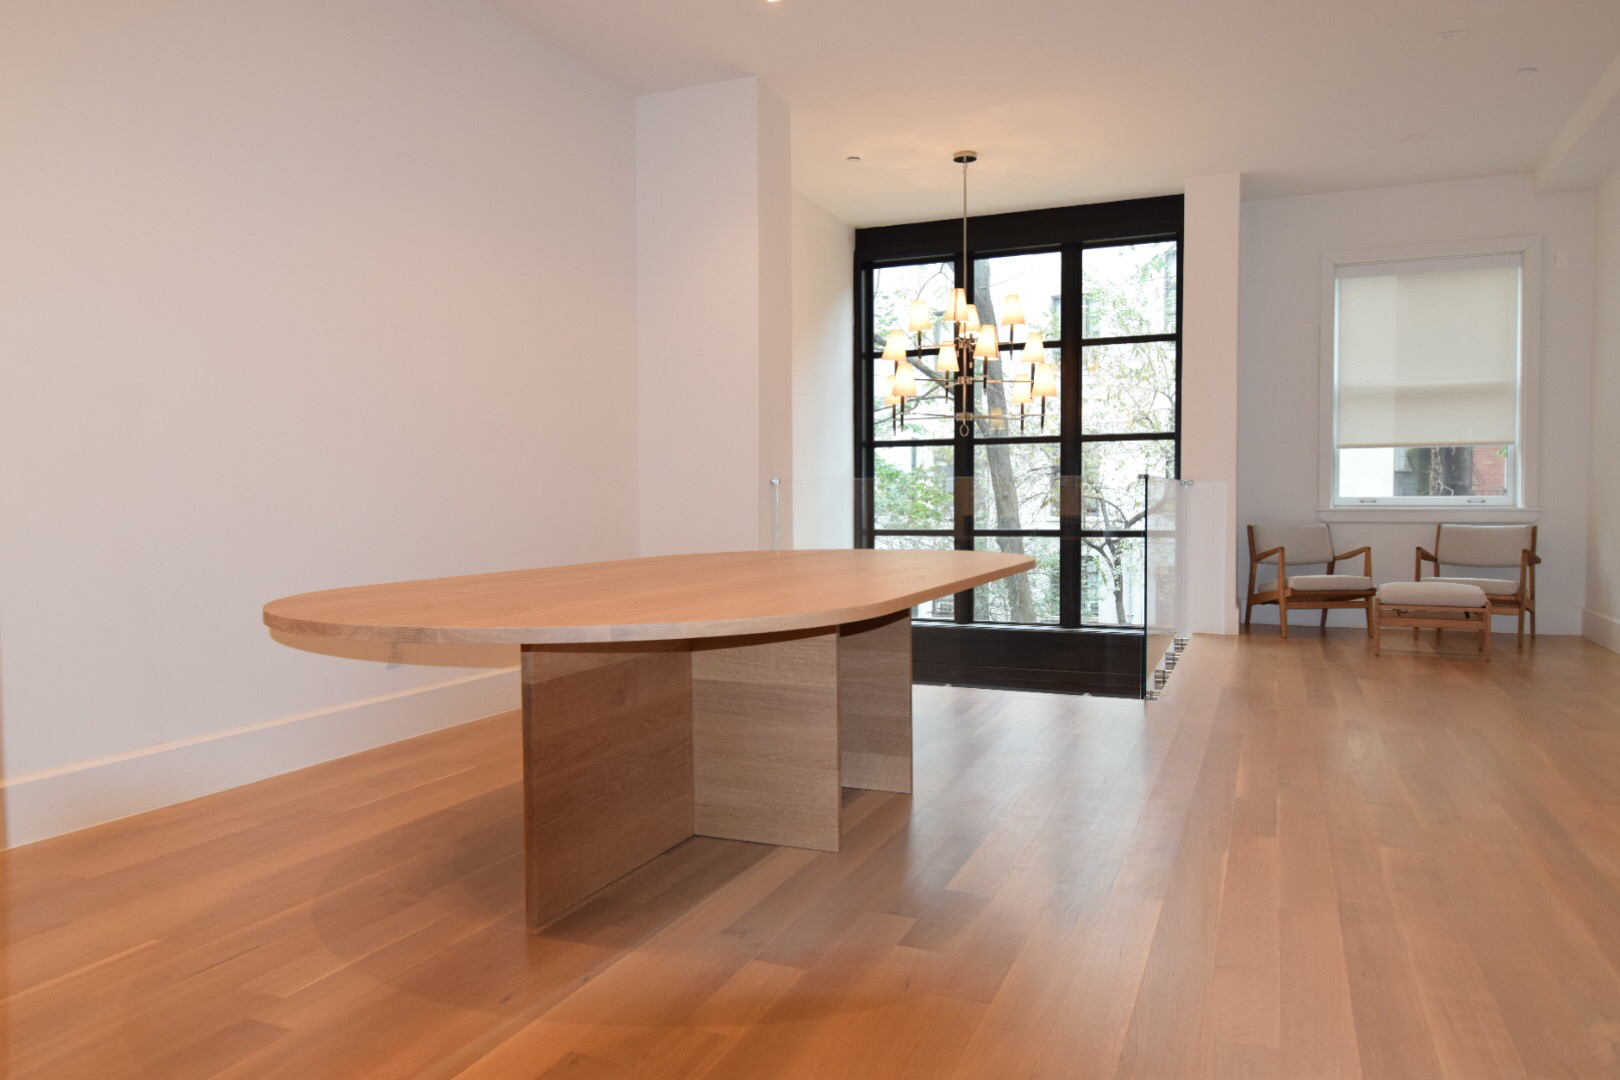 Custom Oval White Oak Table